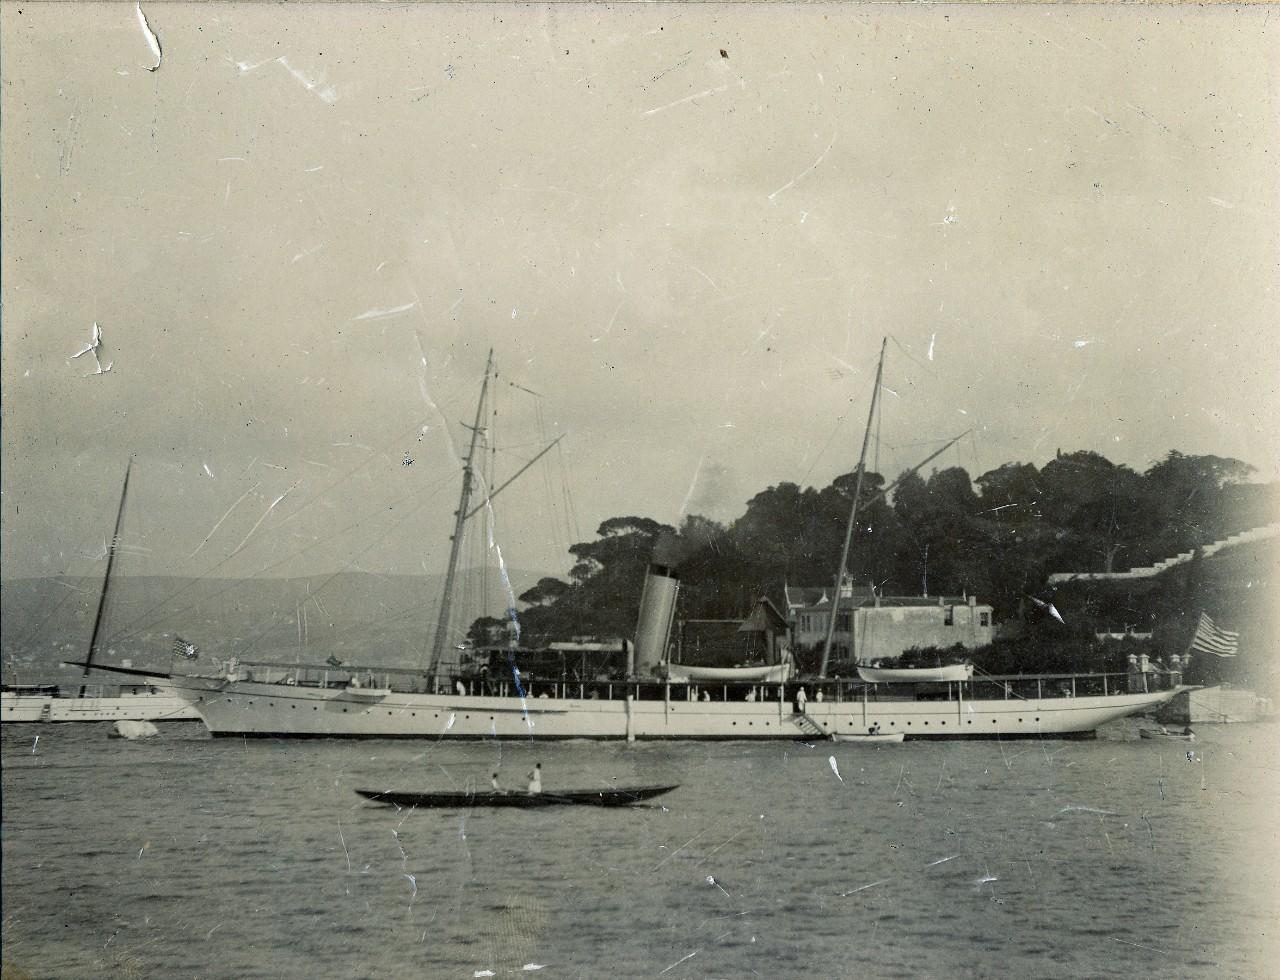 USS Scorpion (PY-3) in Constantinople, circa 1912 NHHC UA 04.01 Margaret Duggan Collection